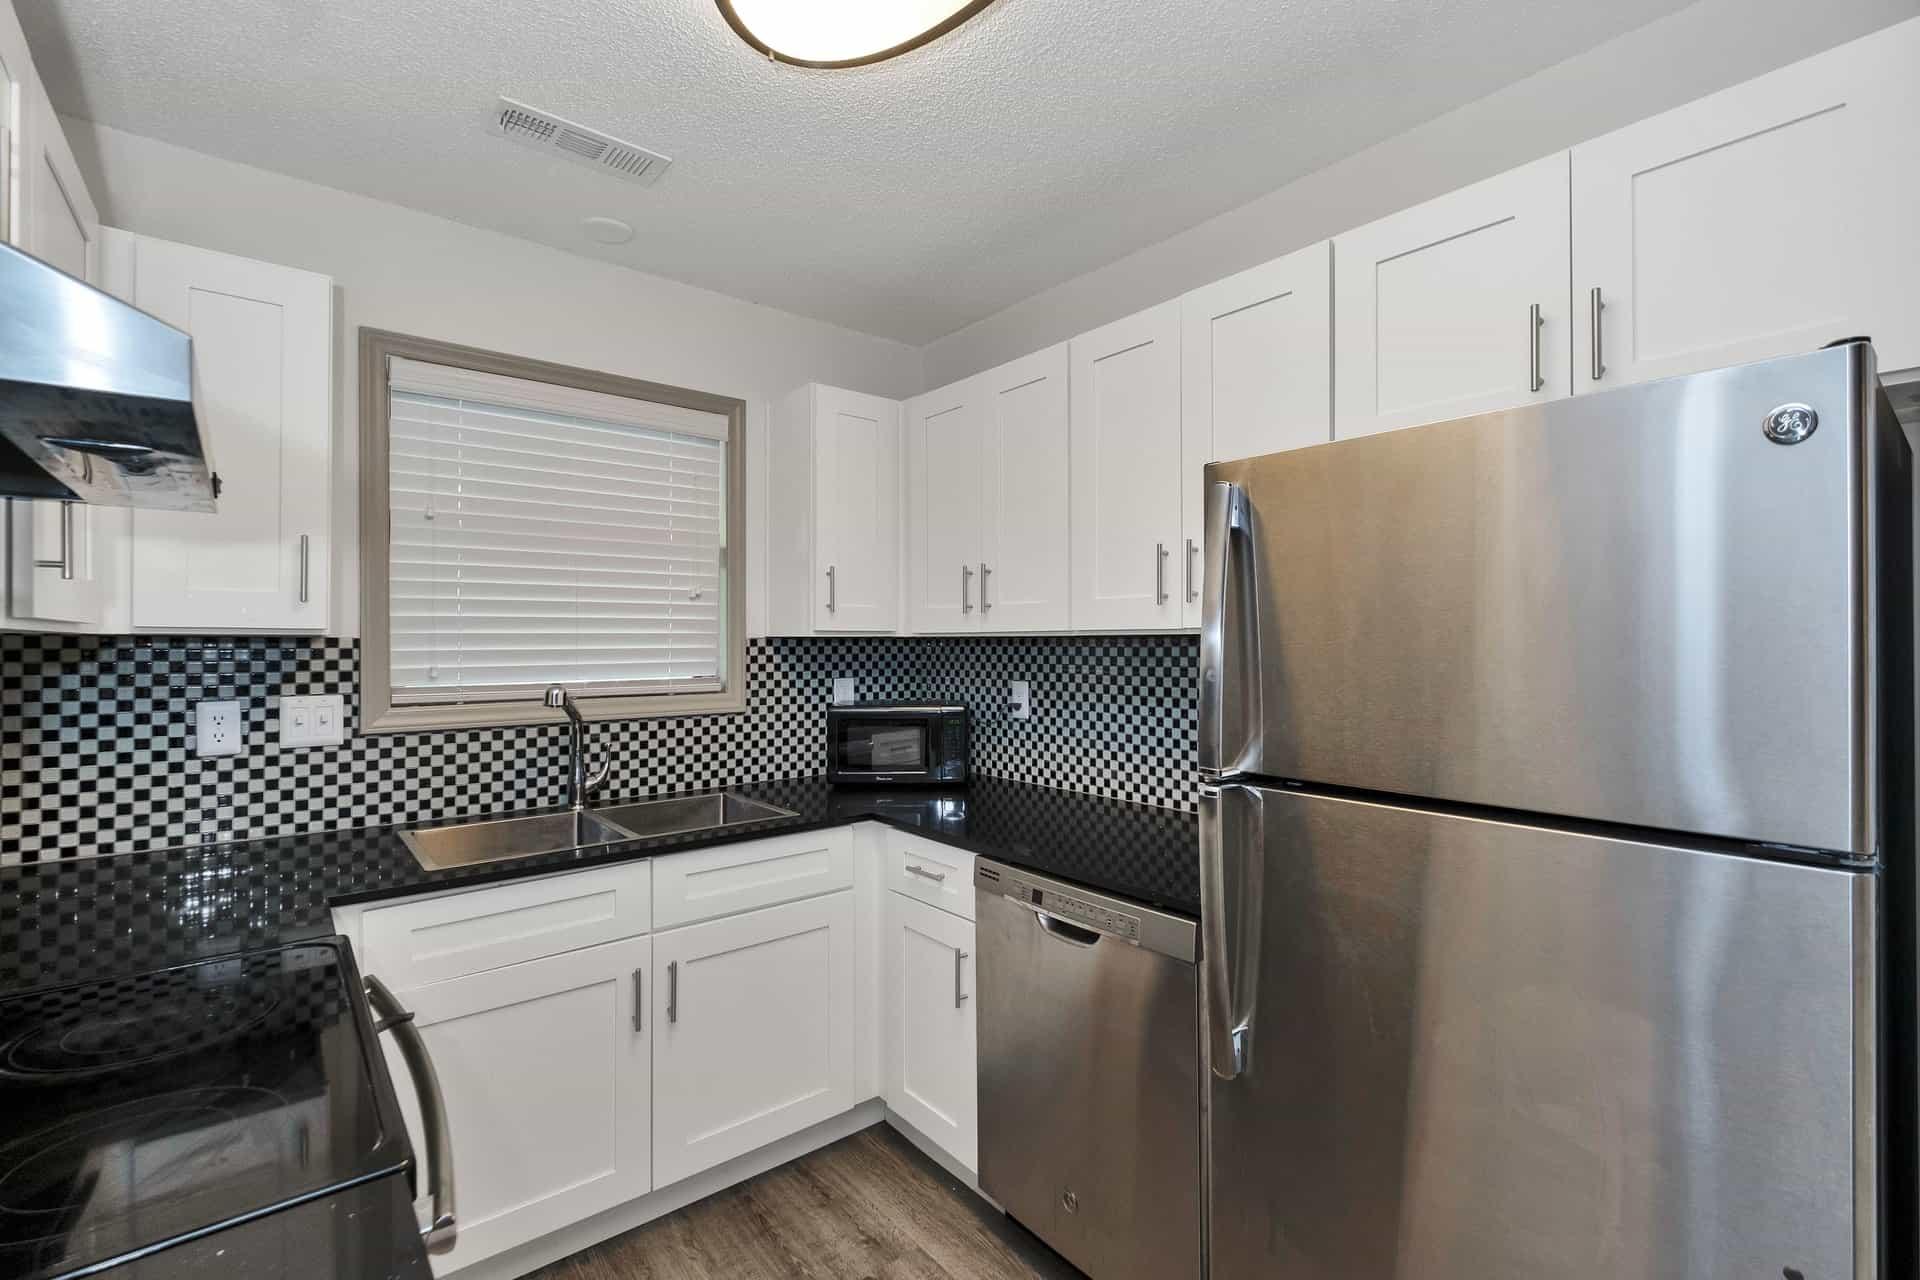 Best LG Counter Depth Refrigerator Options